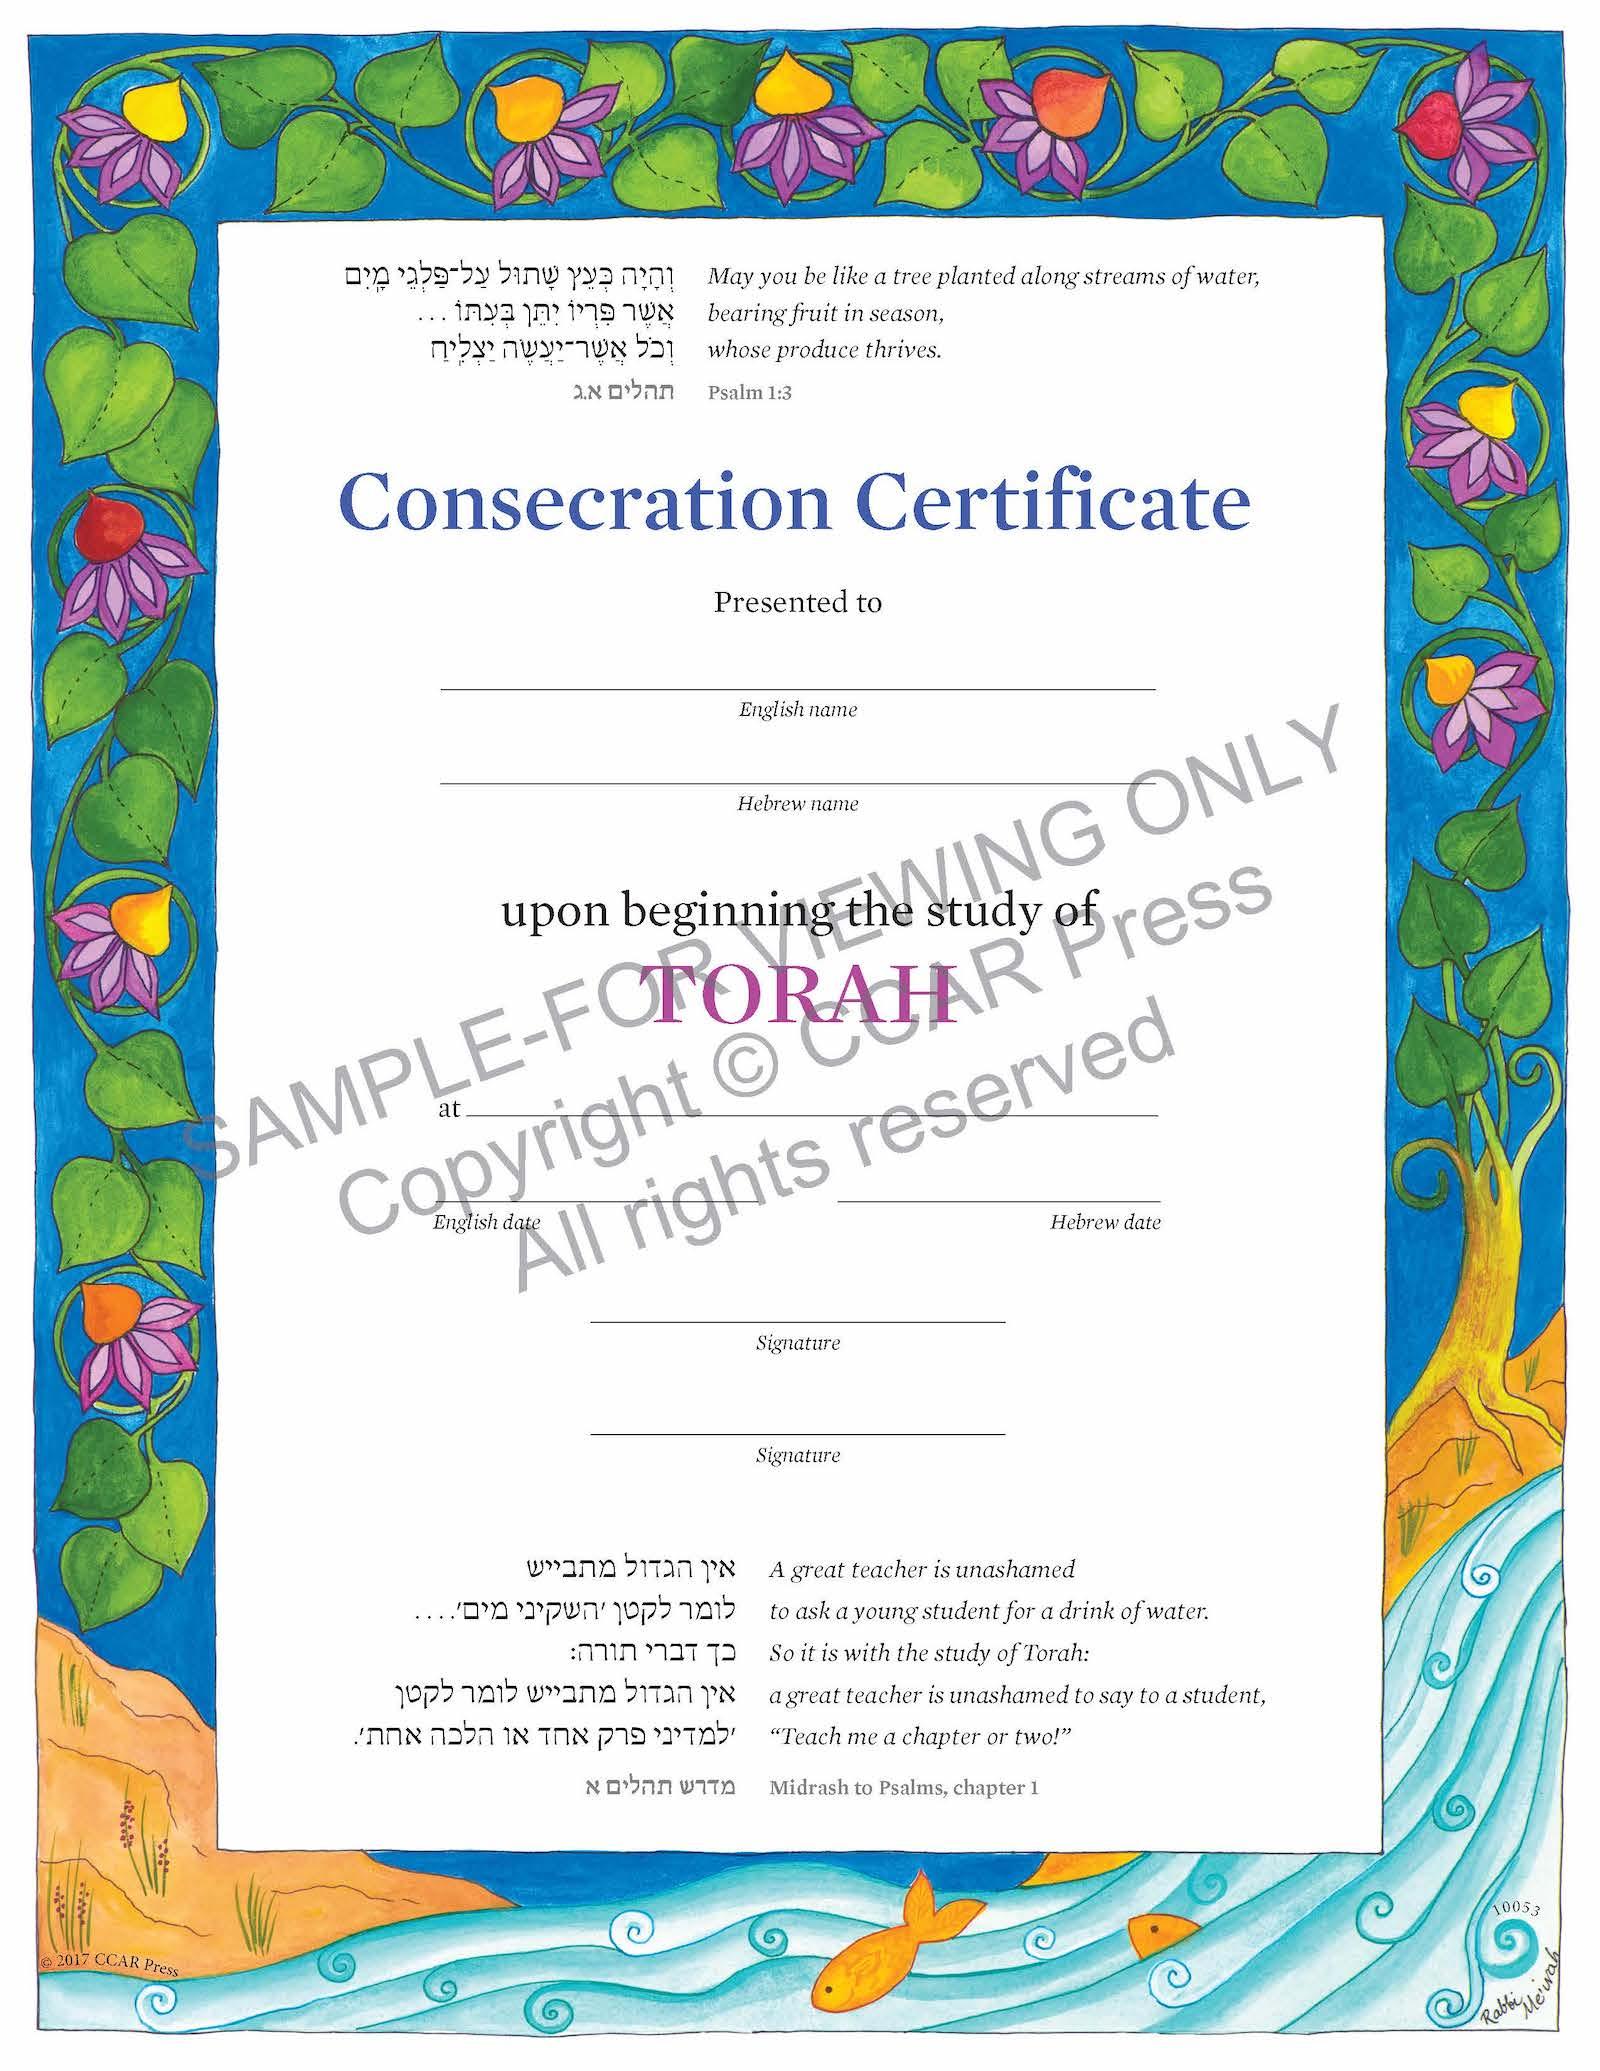 Consecration - Certificate